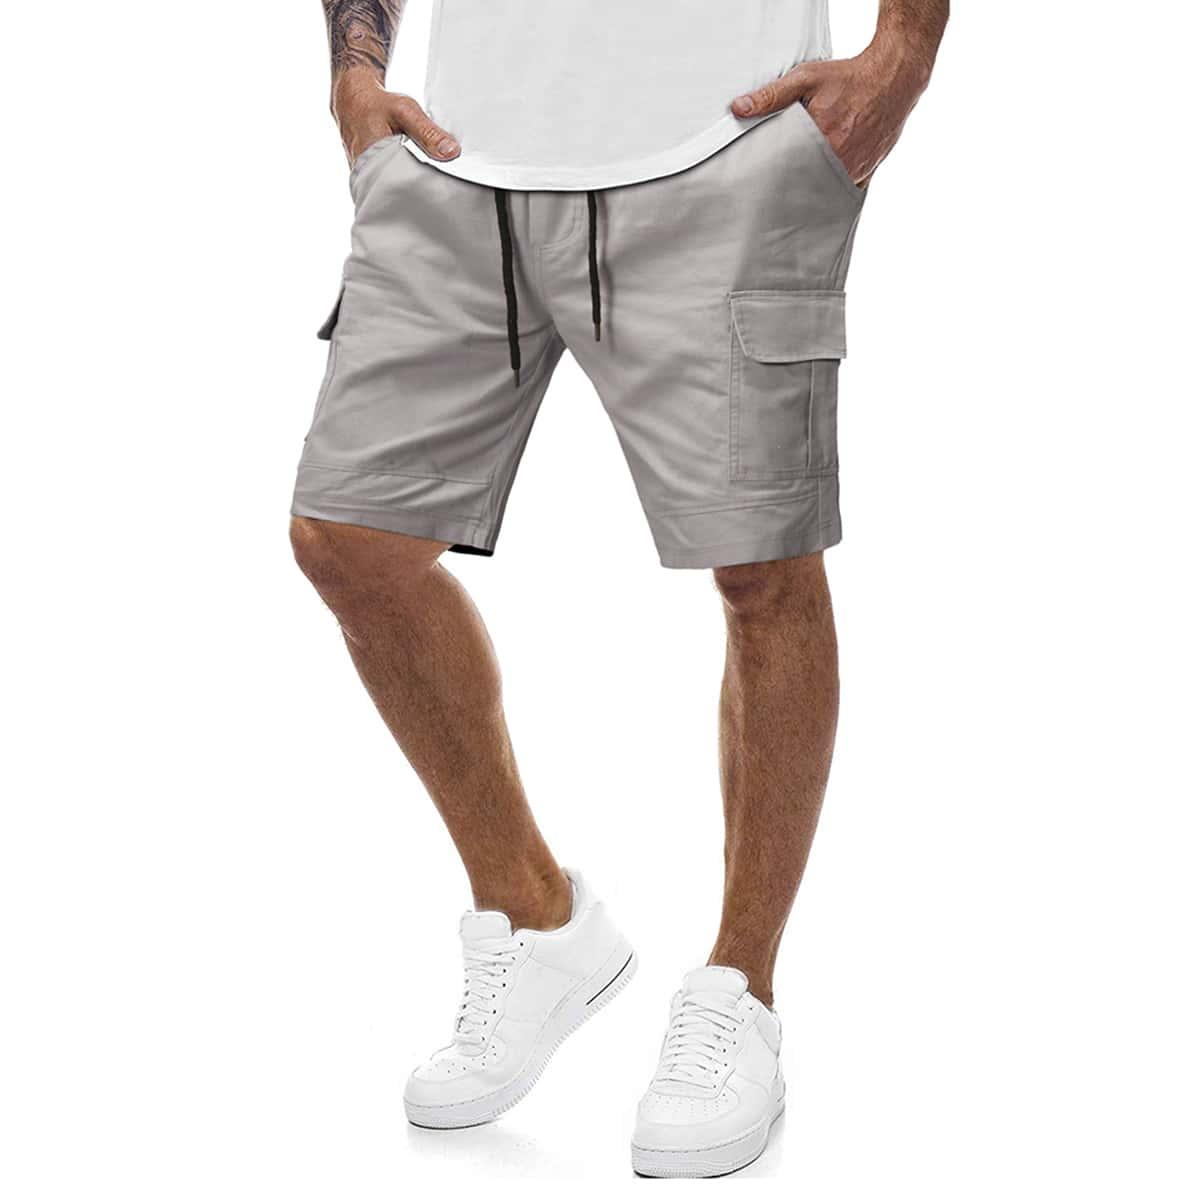 Мужские шорты на кулиске с карманом